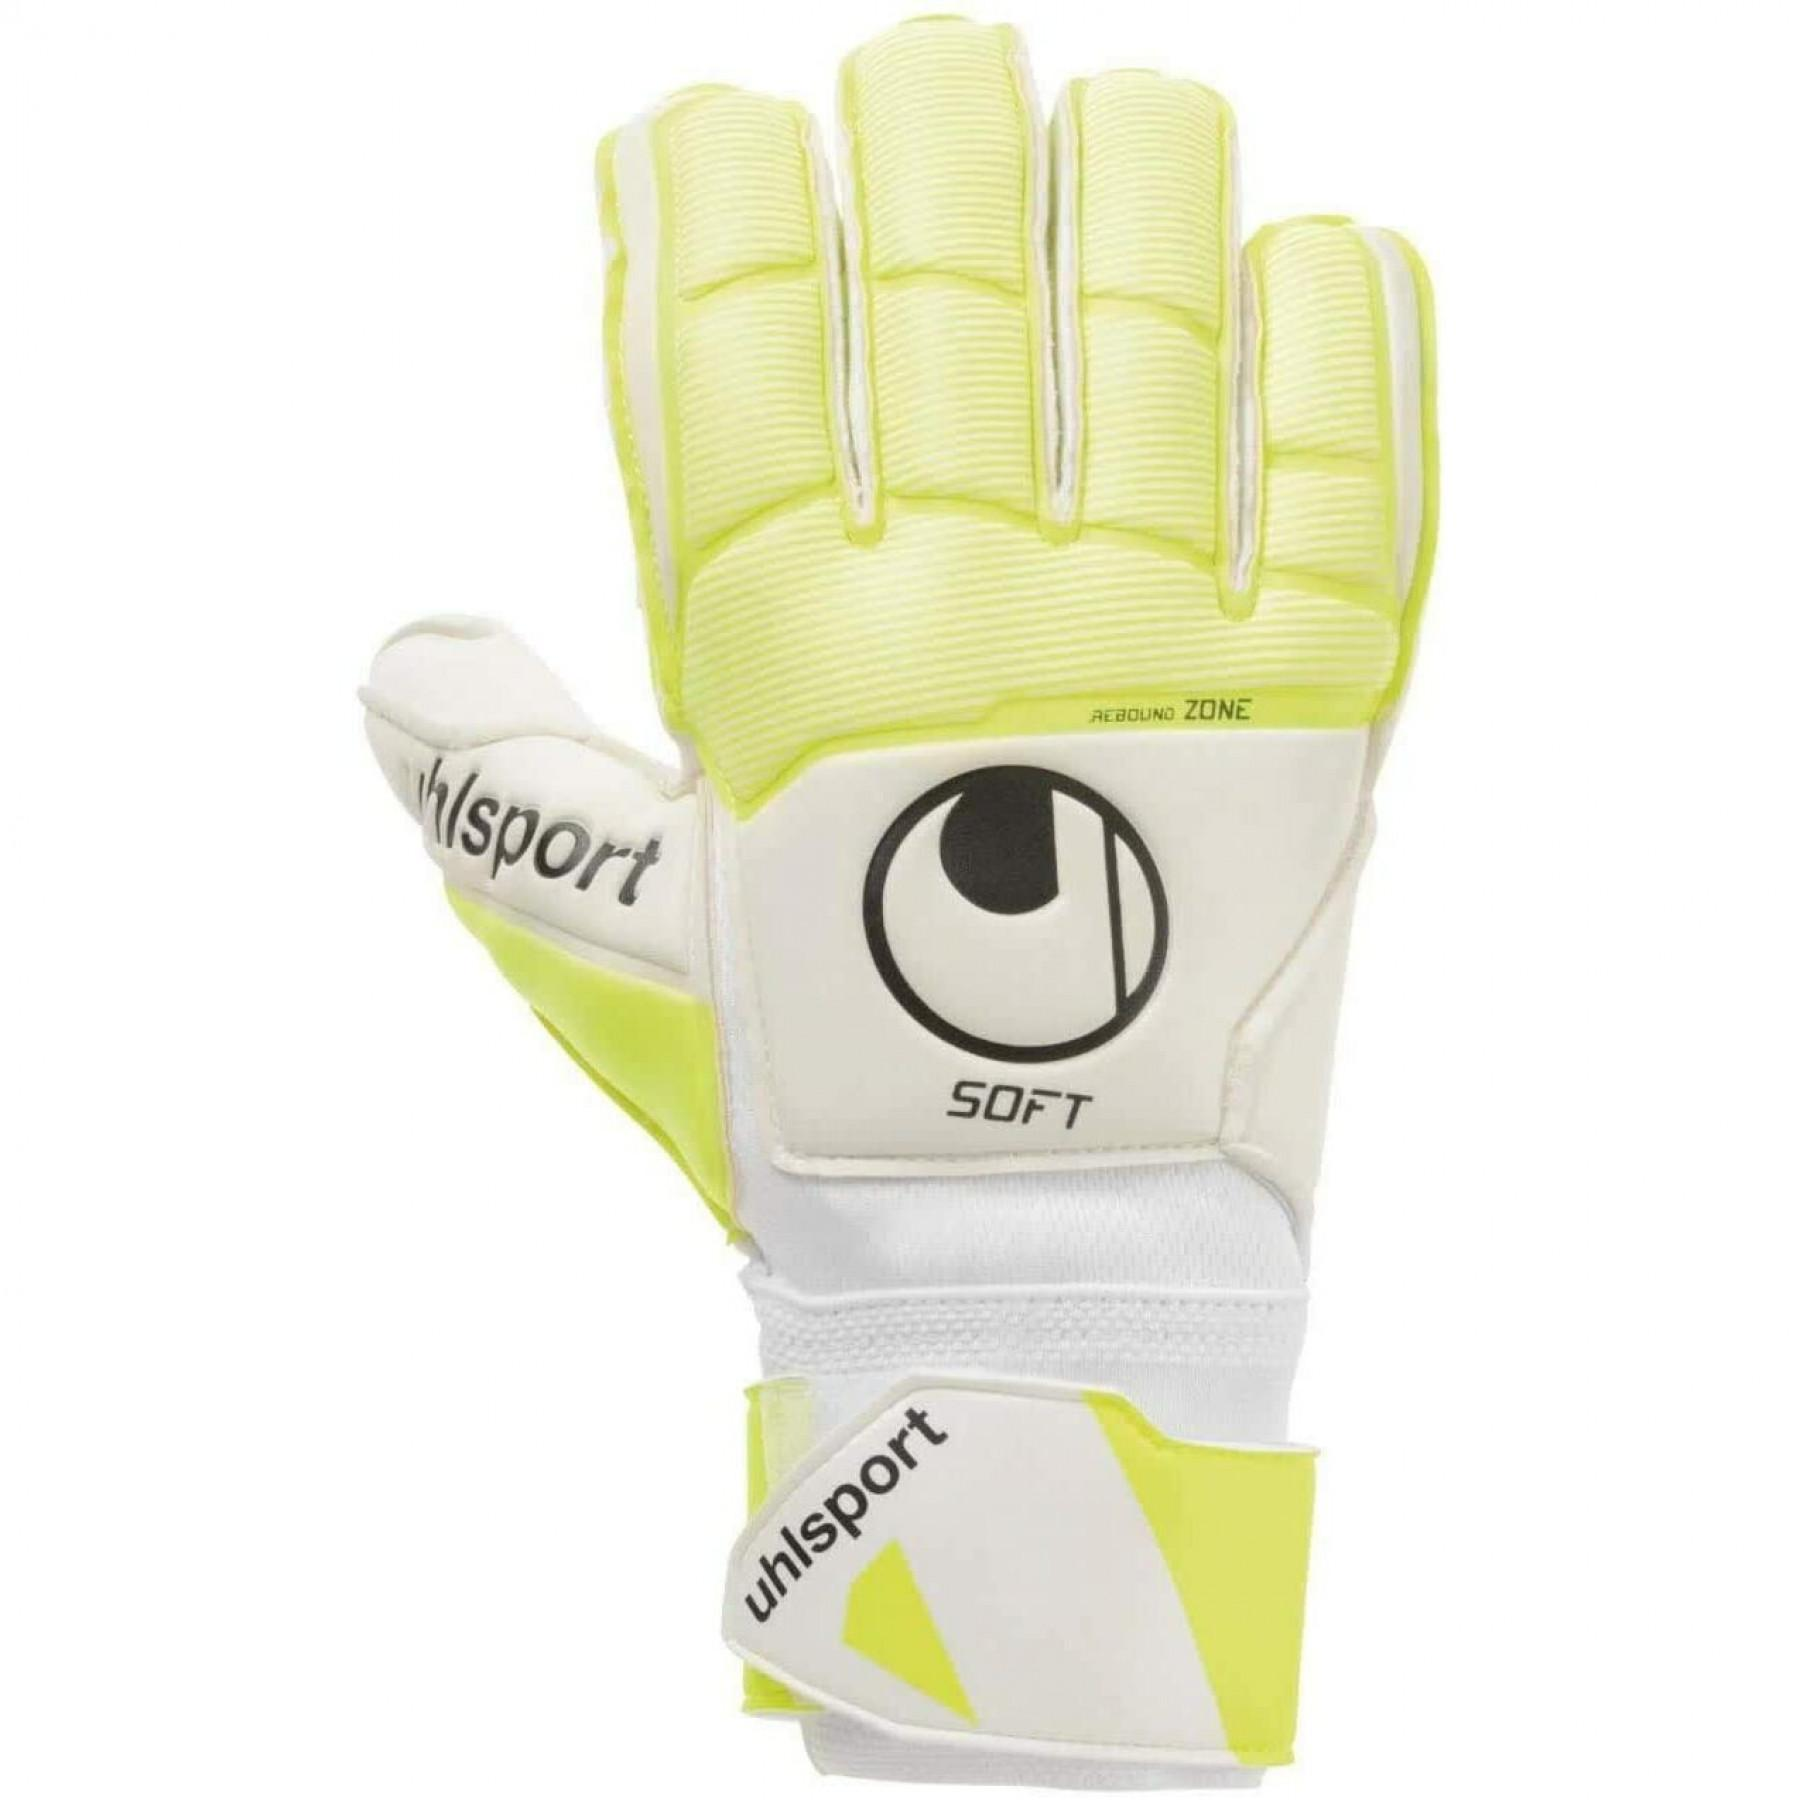 Goalkeeper gloves Uhlsport Pure Alliance Soft Flex Frame